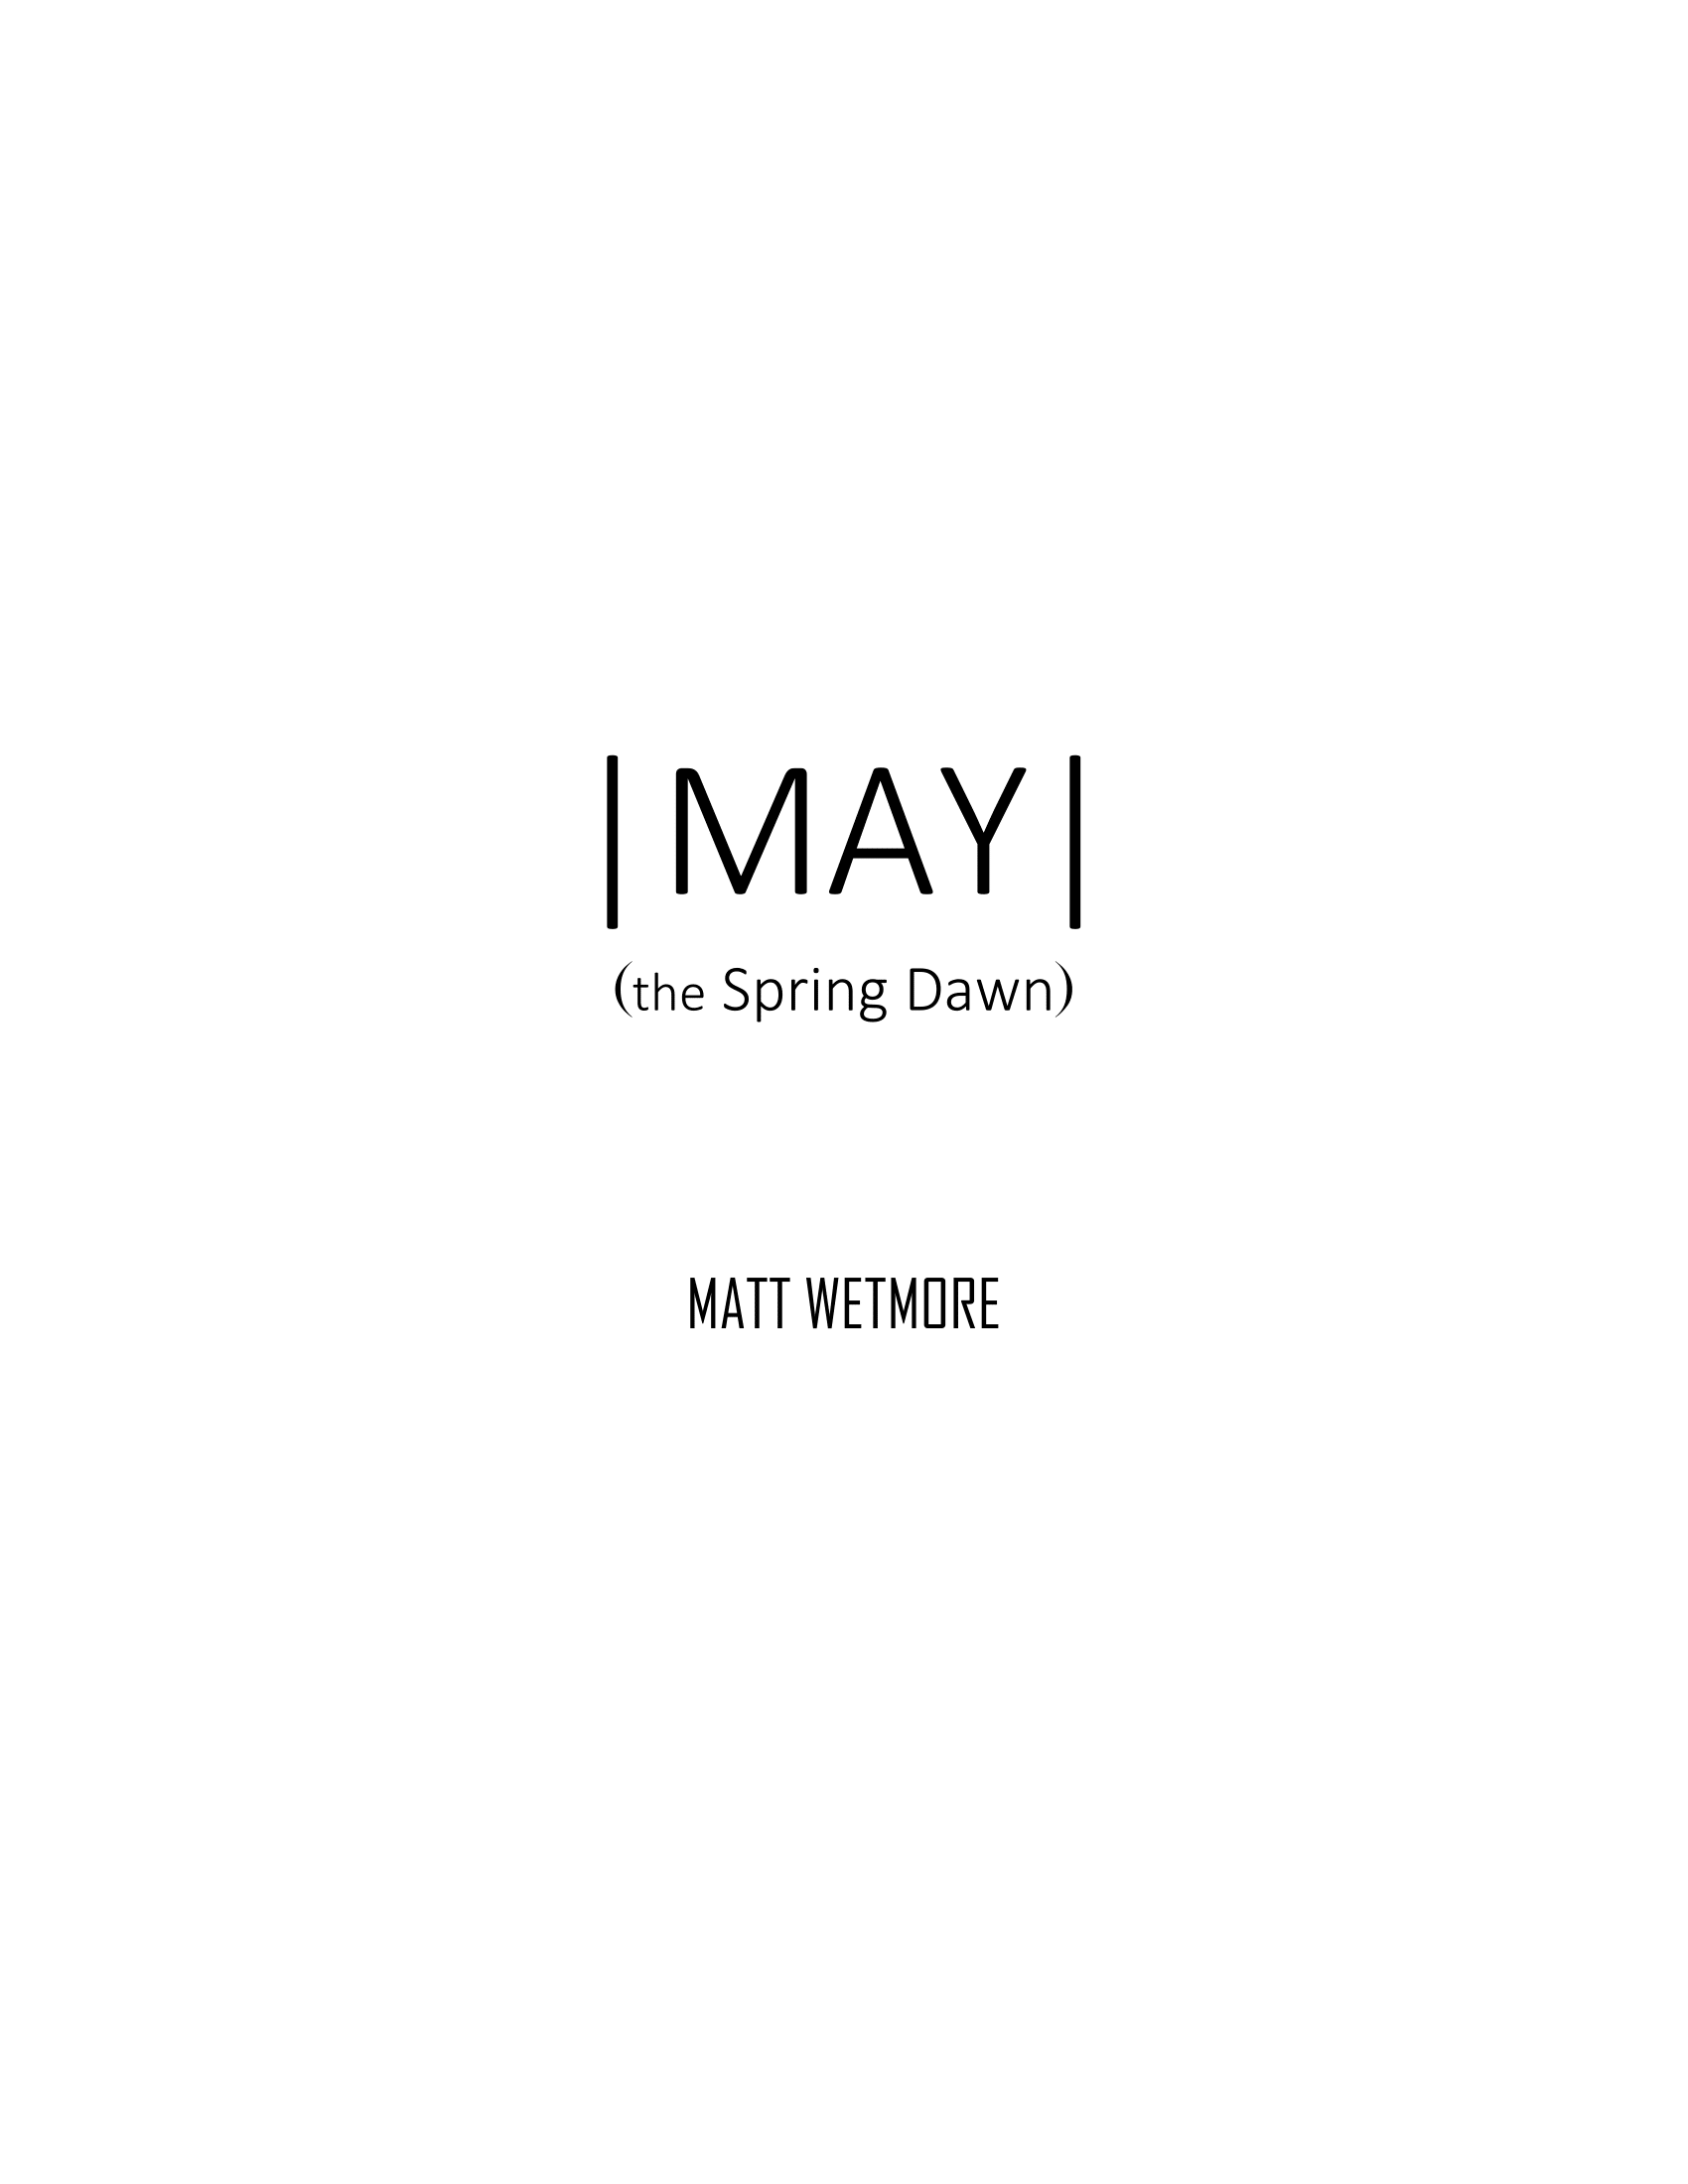 MaySpringDawn - Full Score-01.png